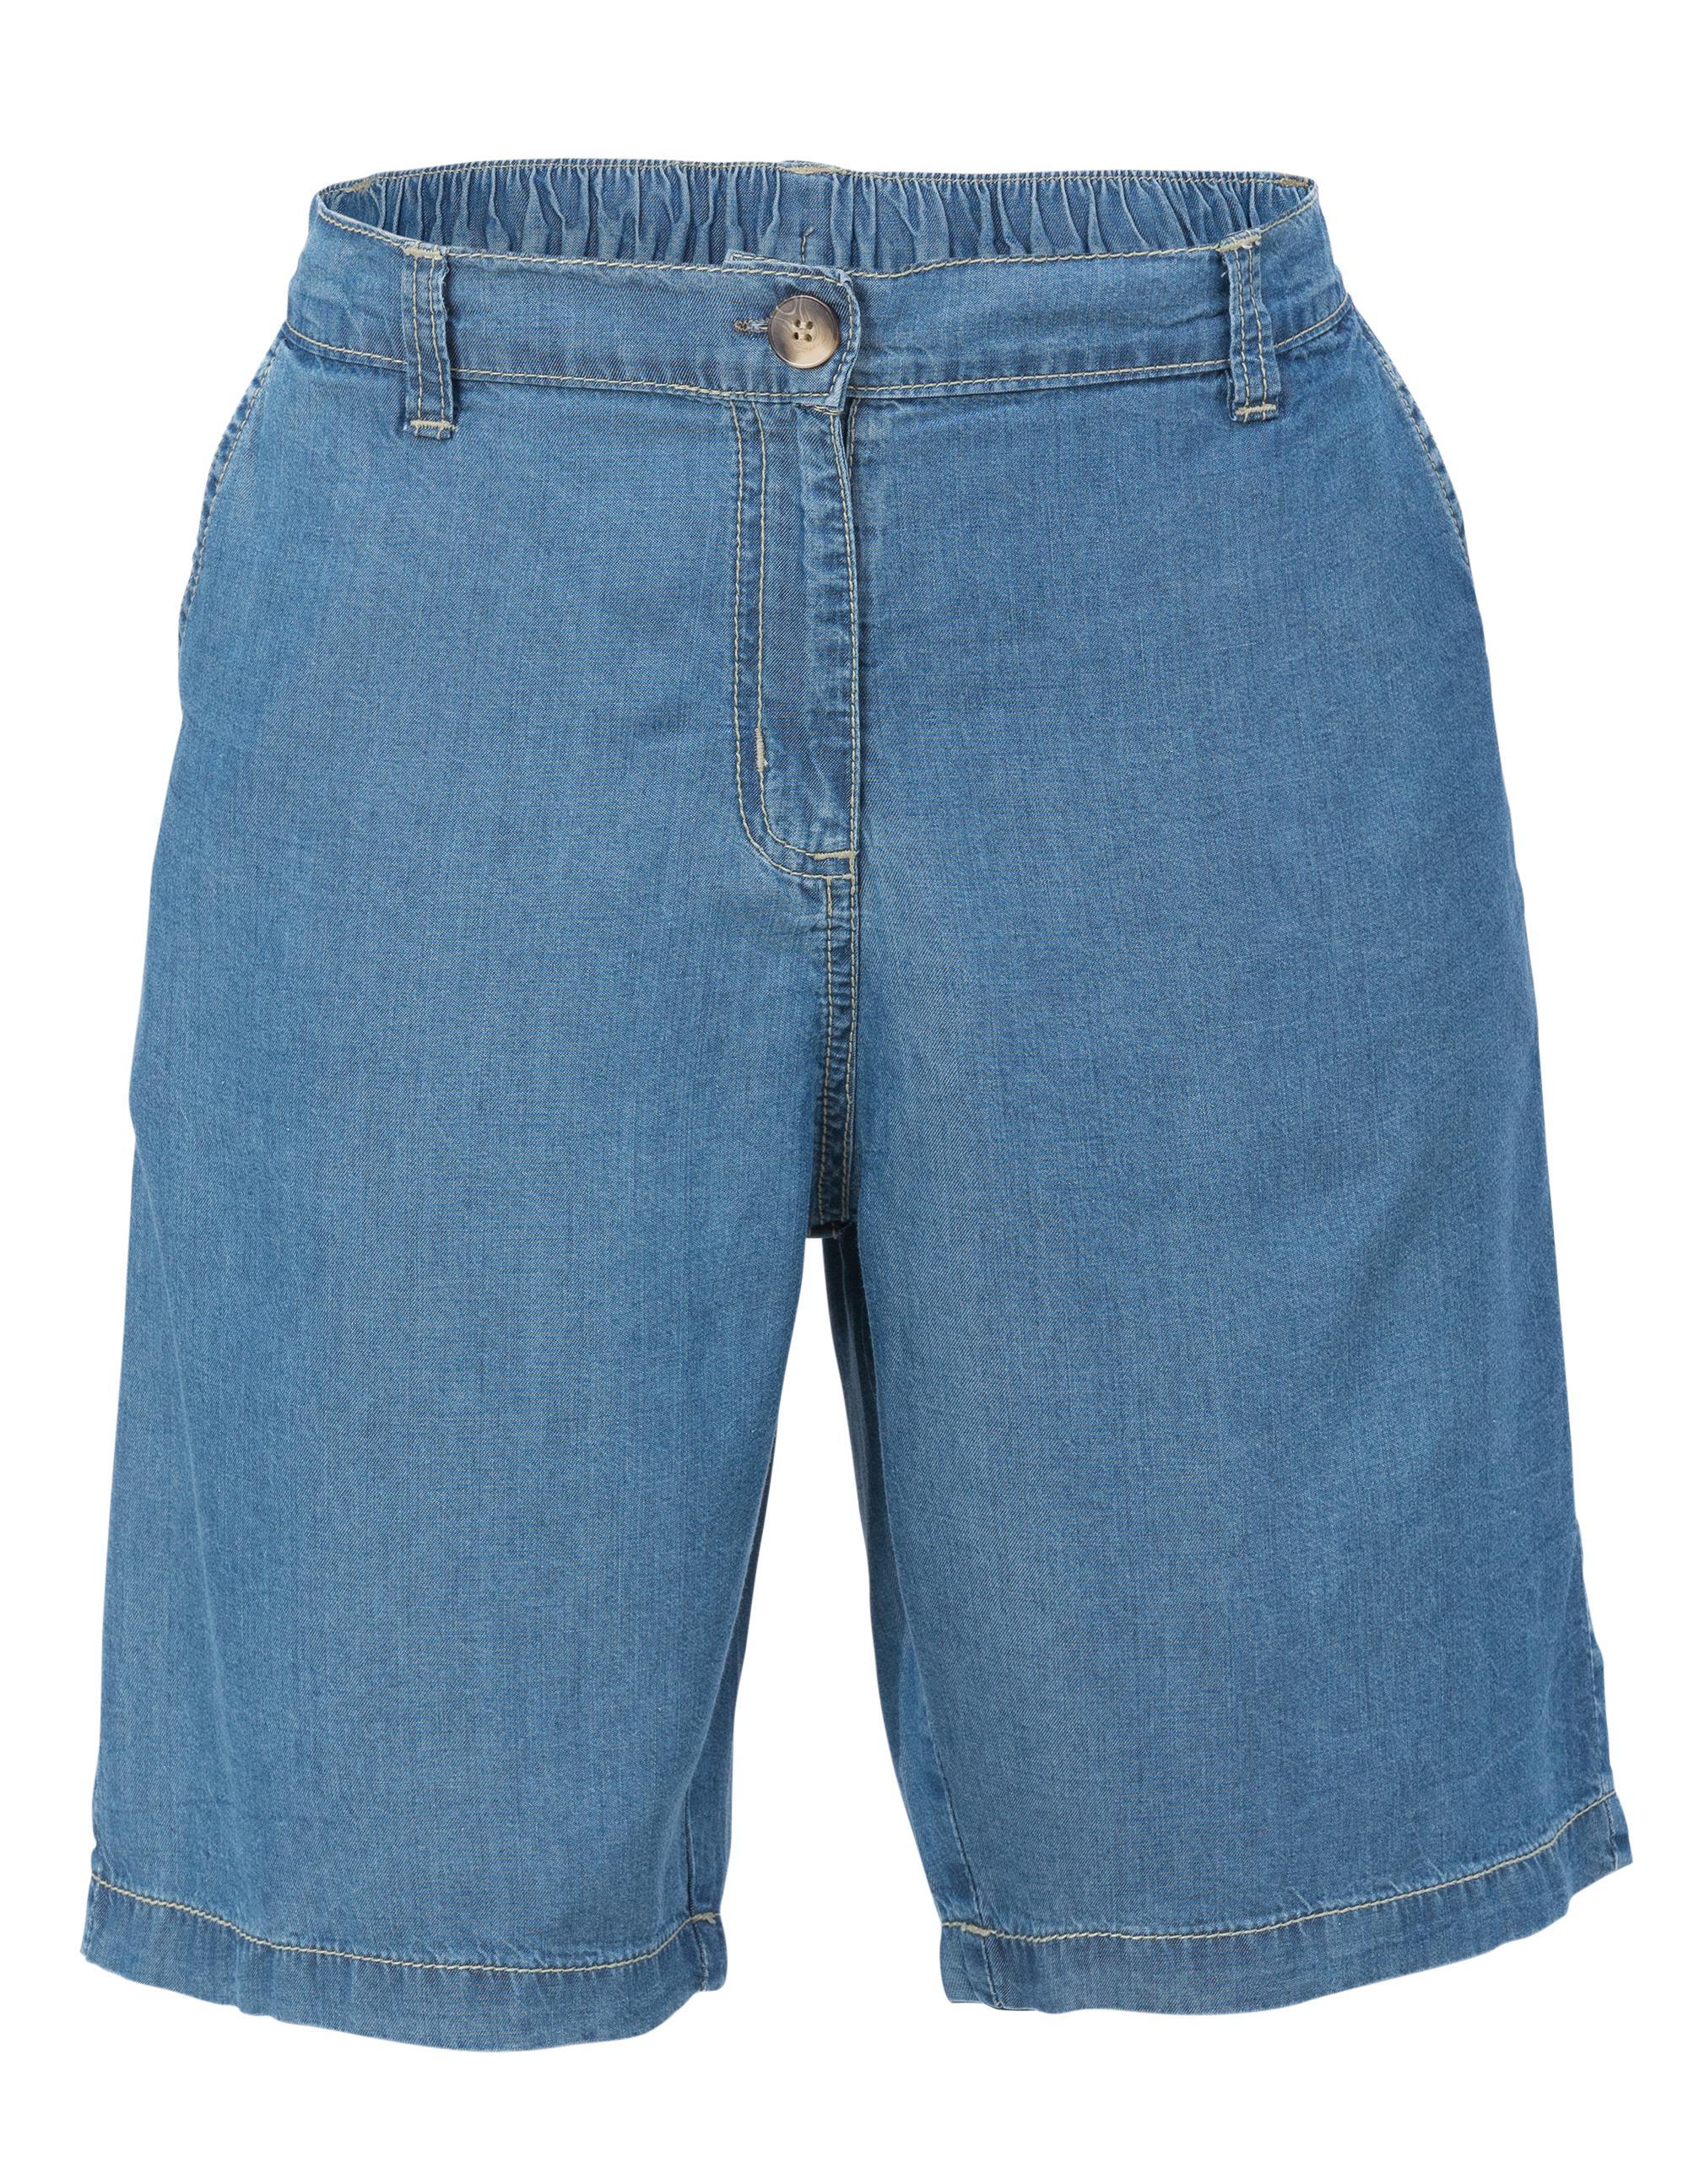 Shorts Halvlånga Tencel Jeansblå